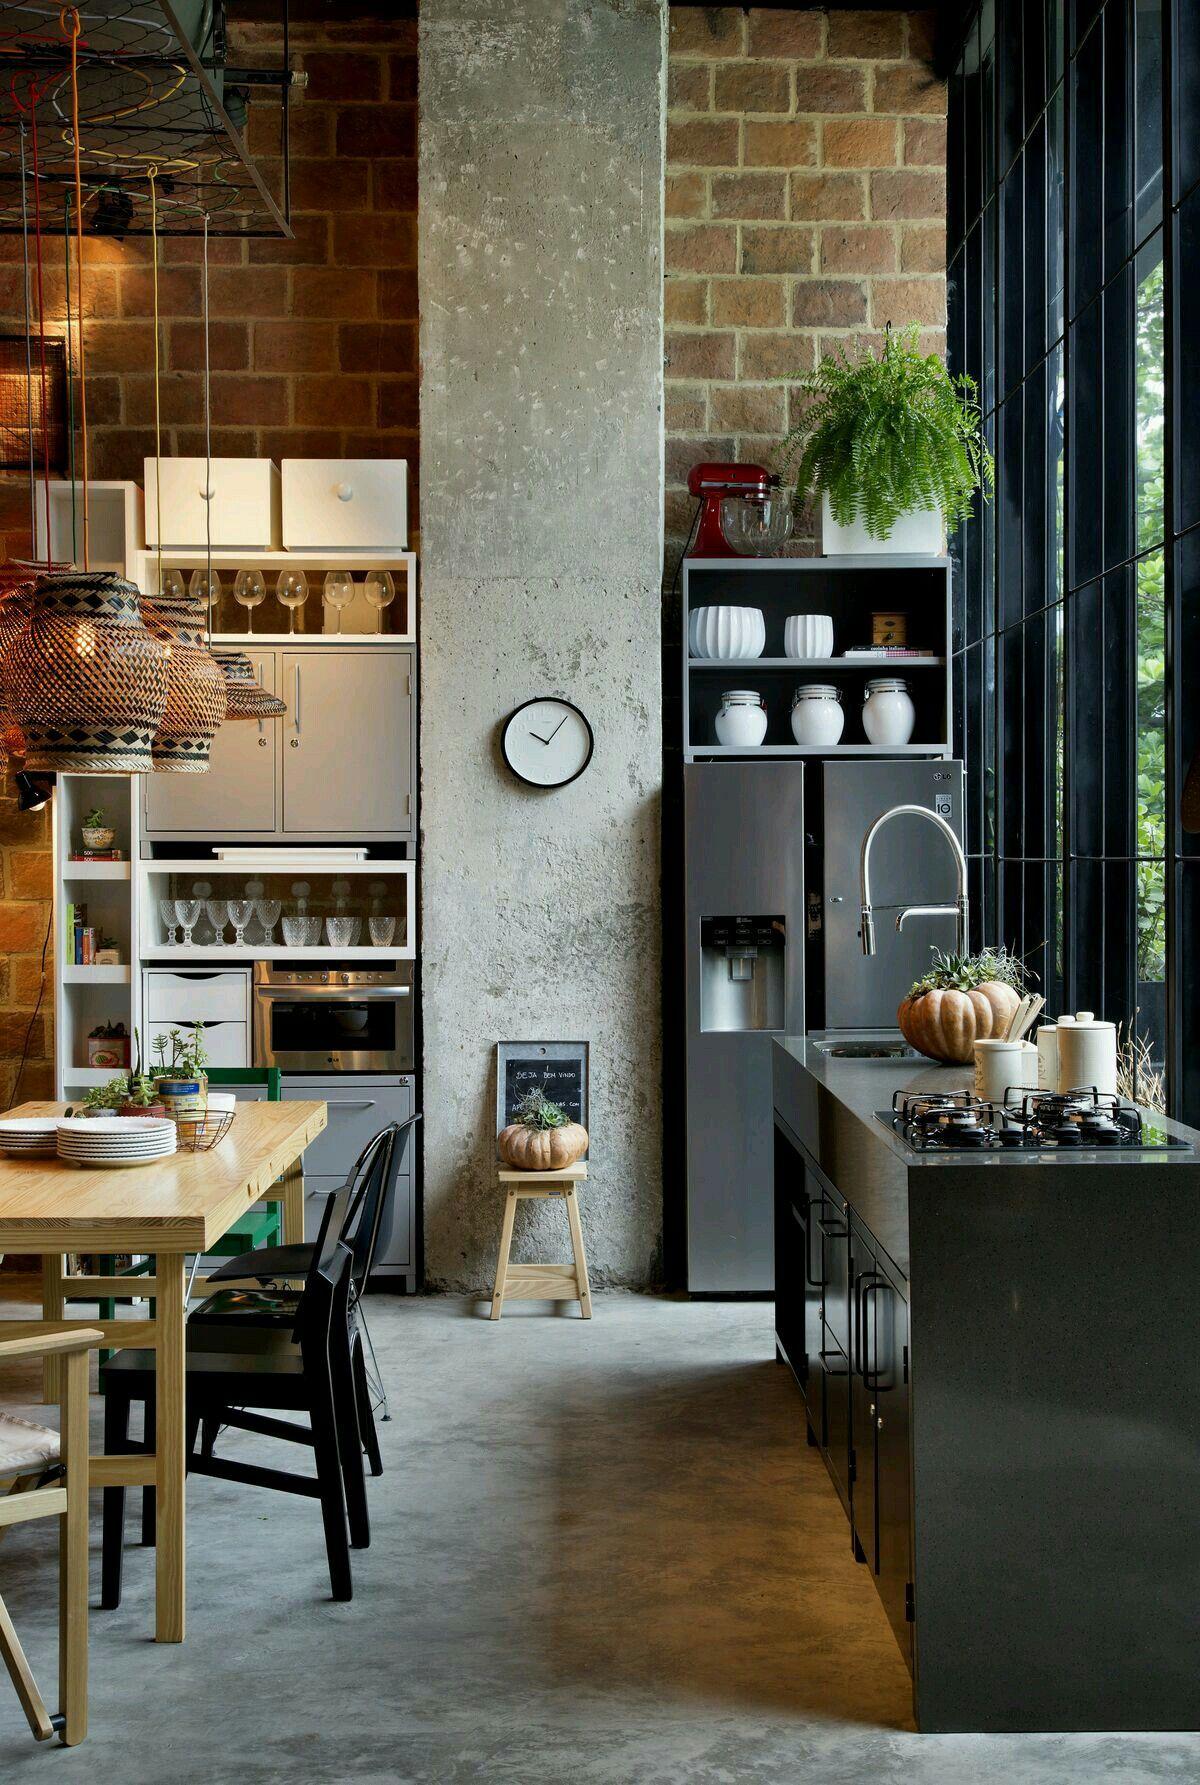 Pin von Hannah Ruth Brade Nel auf A home for the future | Pinterest